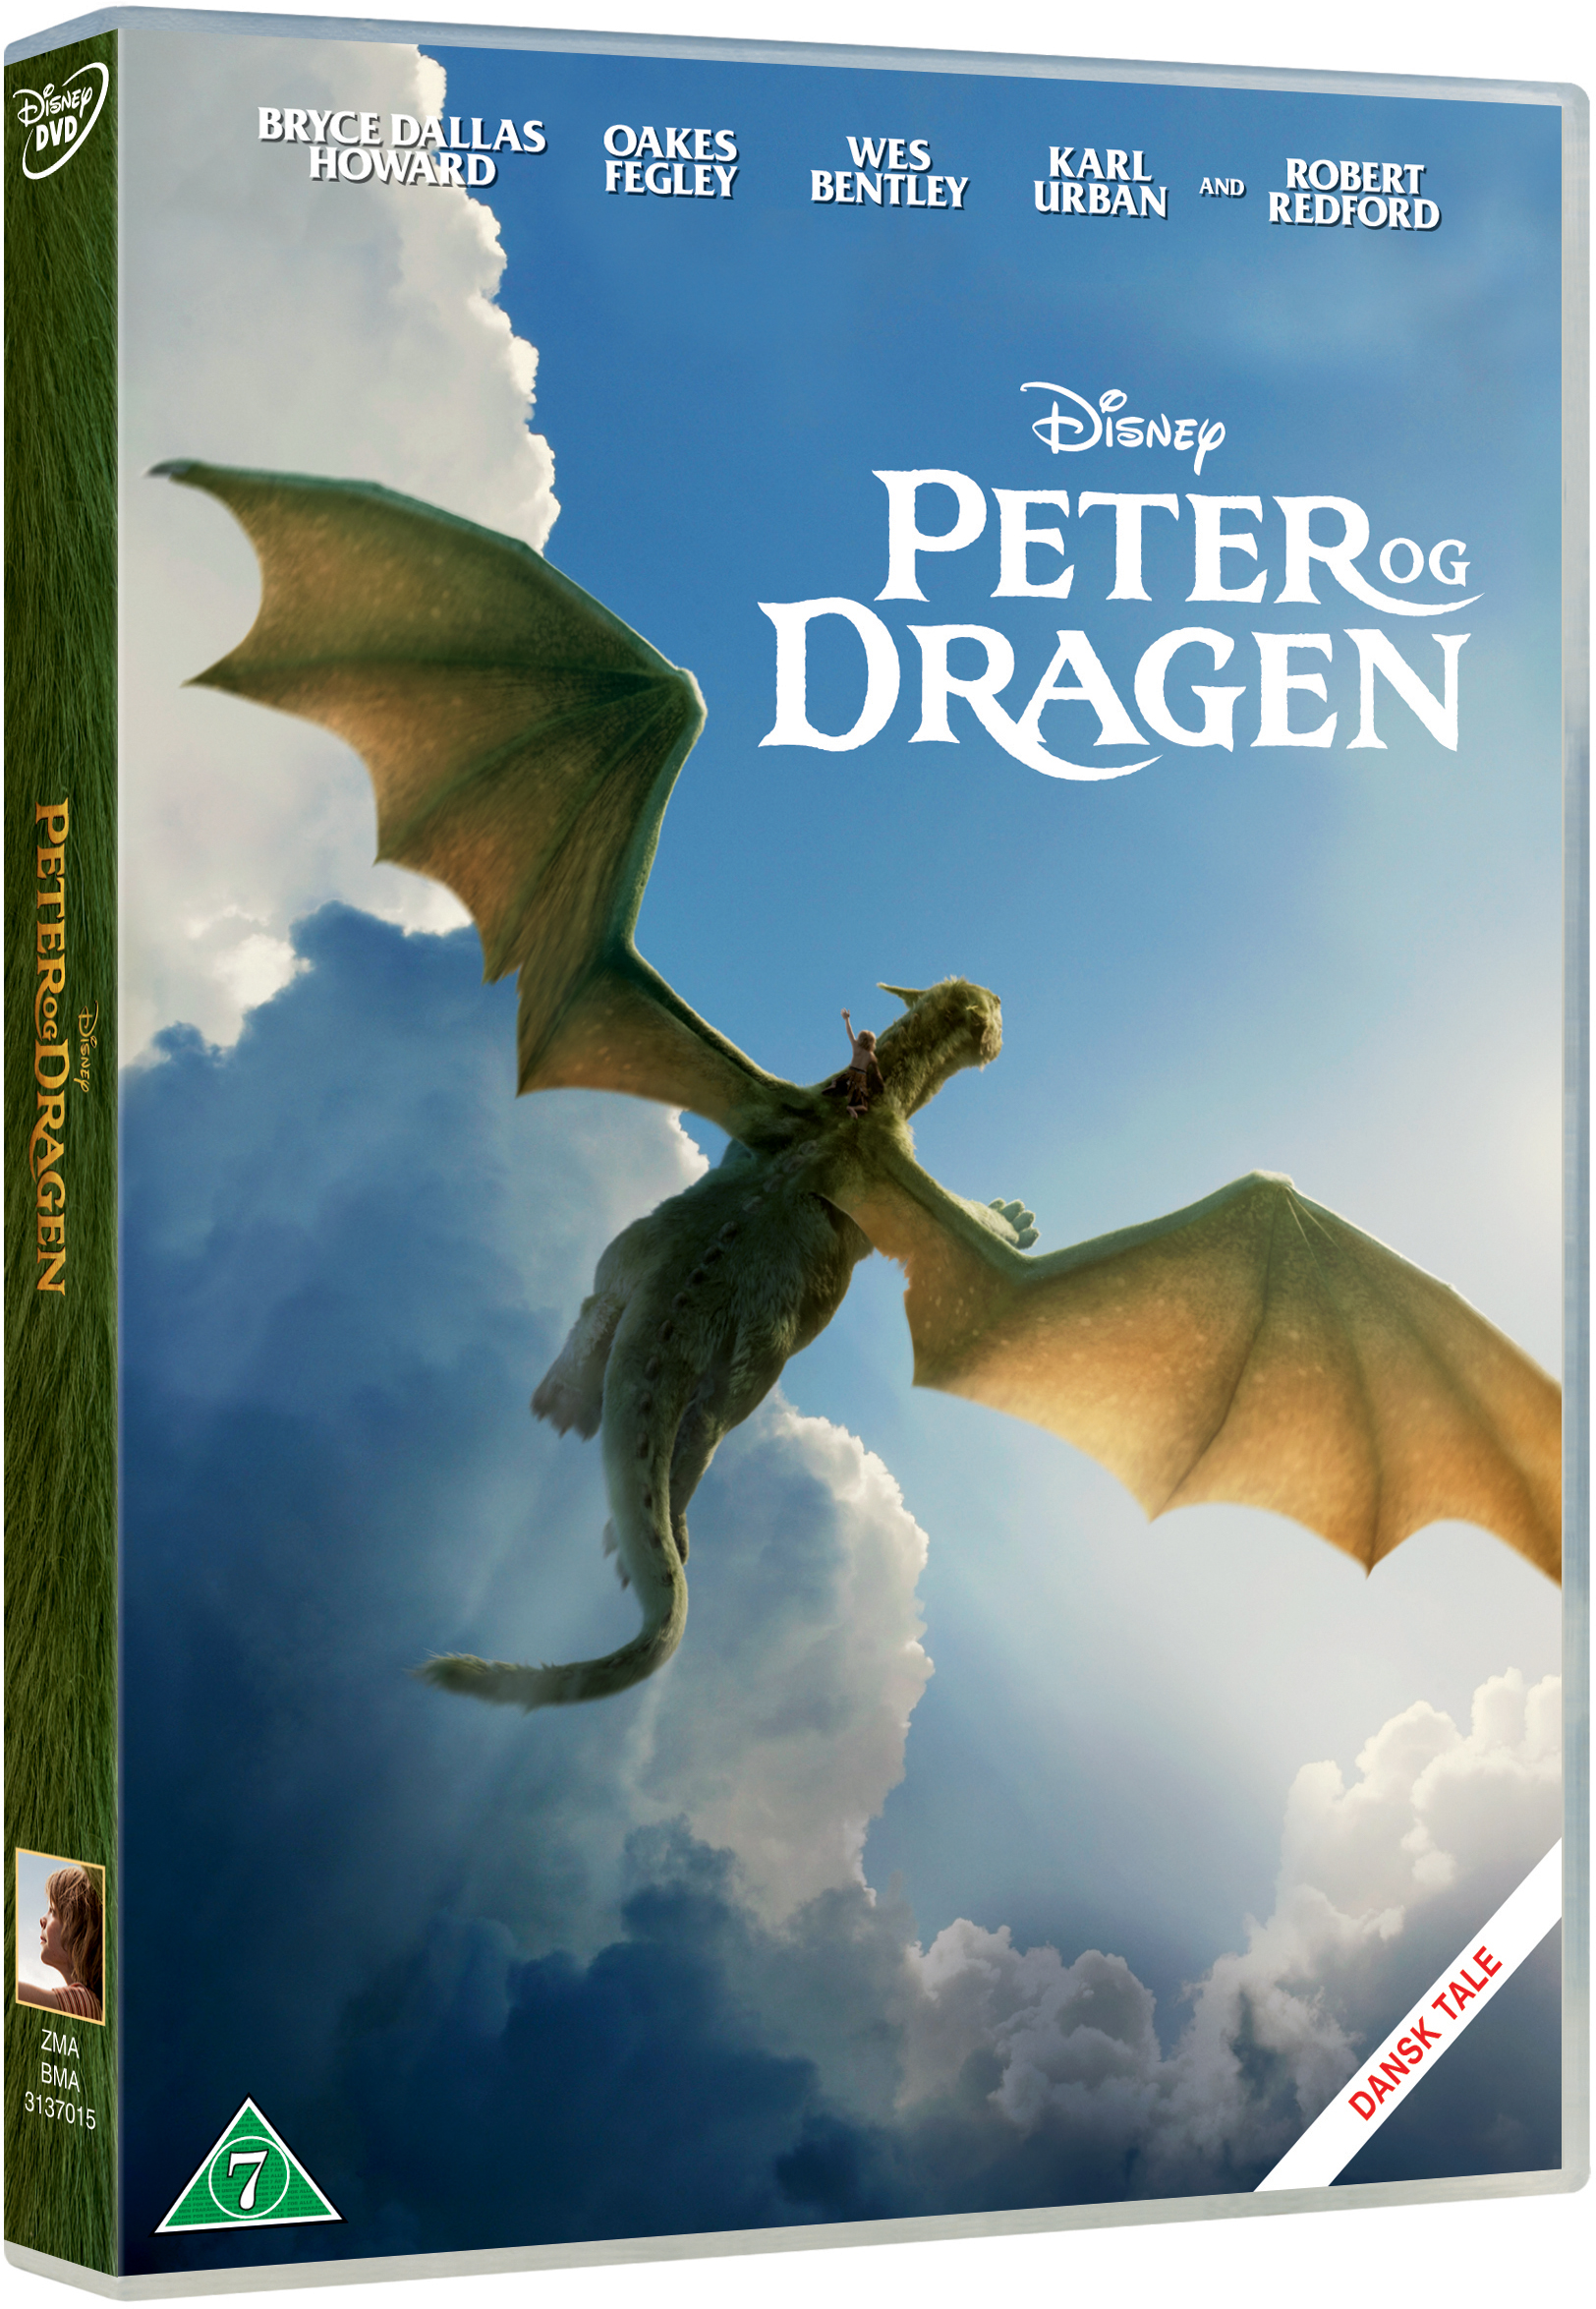 Disneys - Peters Dragon/Peter Og Dragen - 2016 - DVD